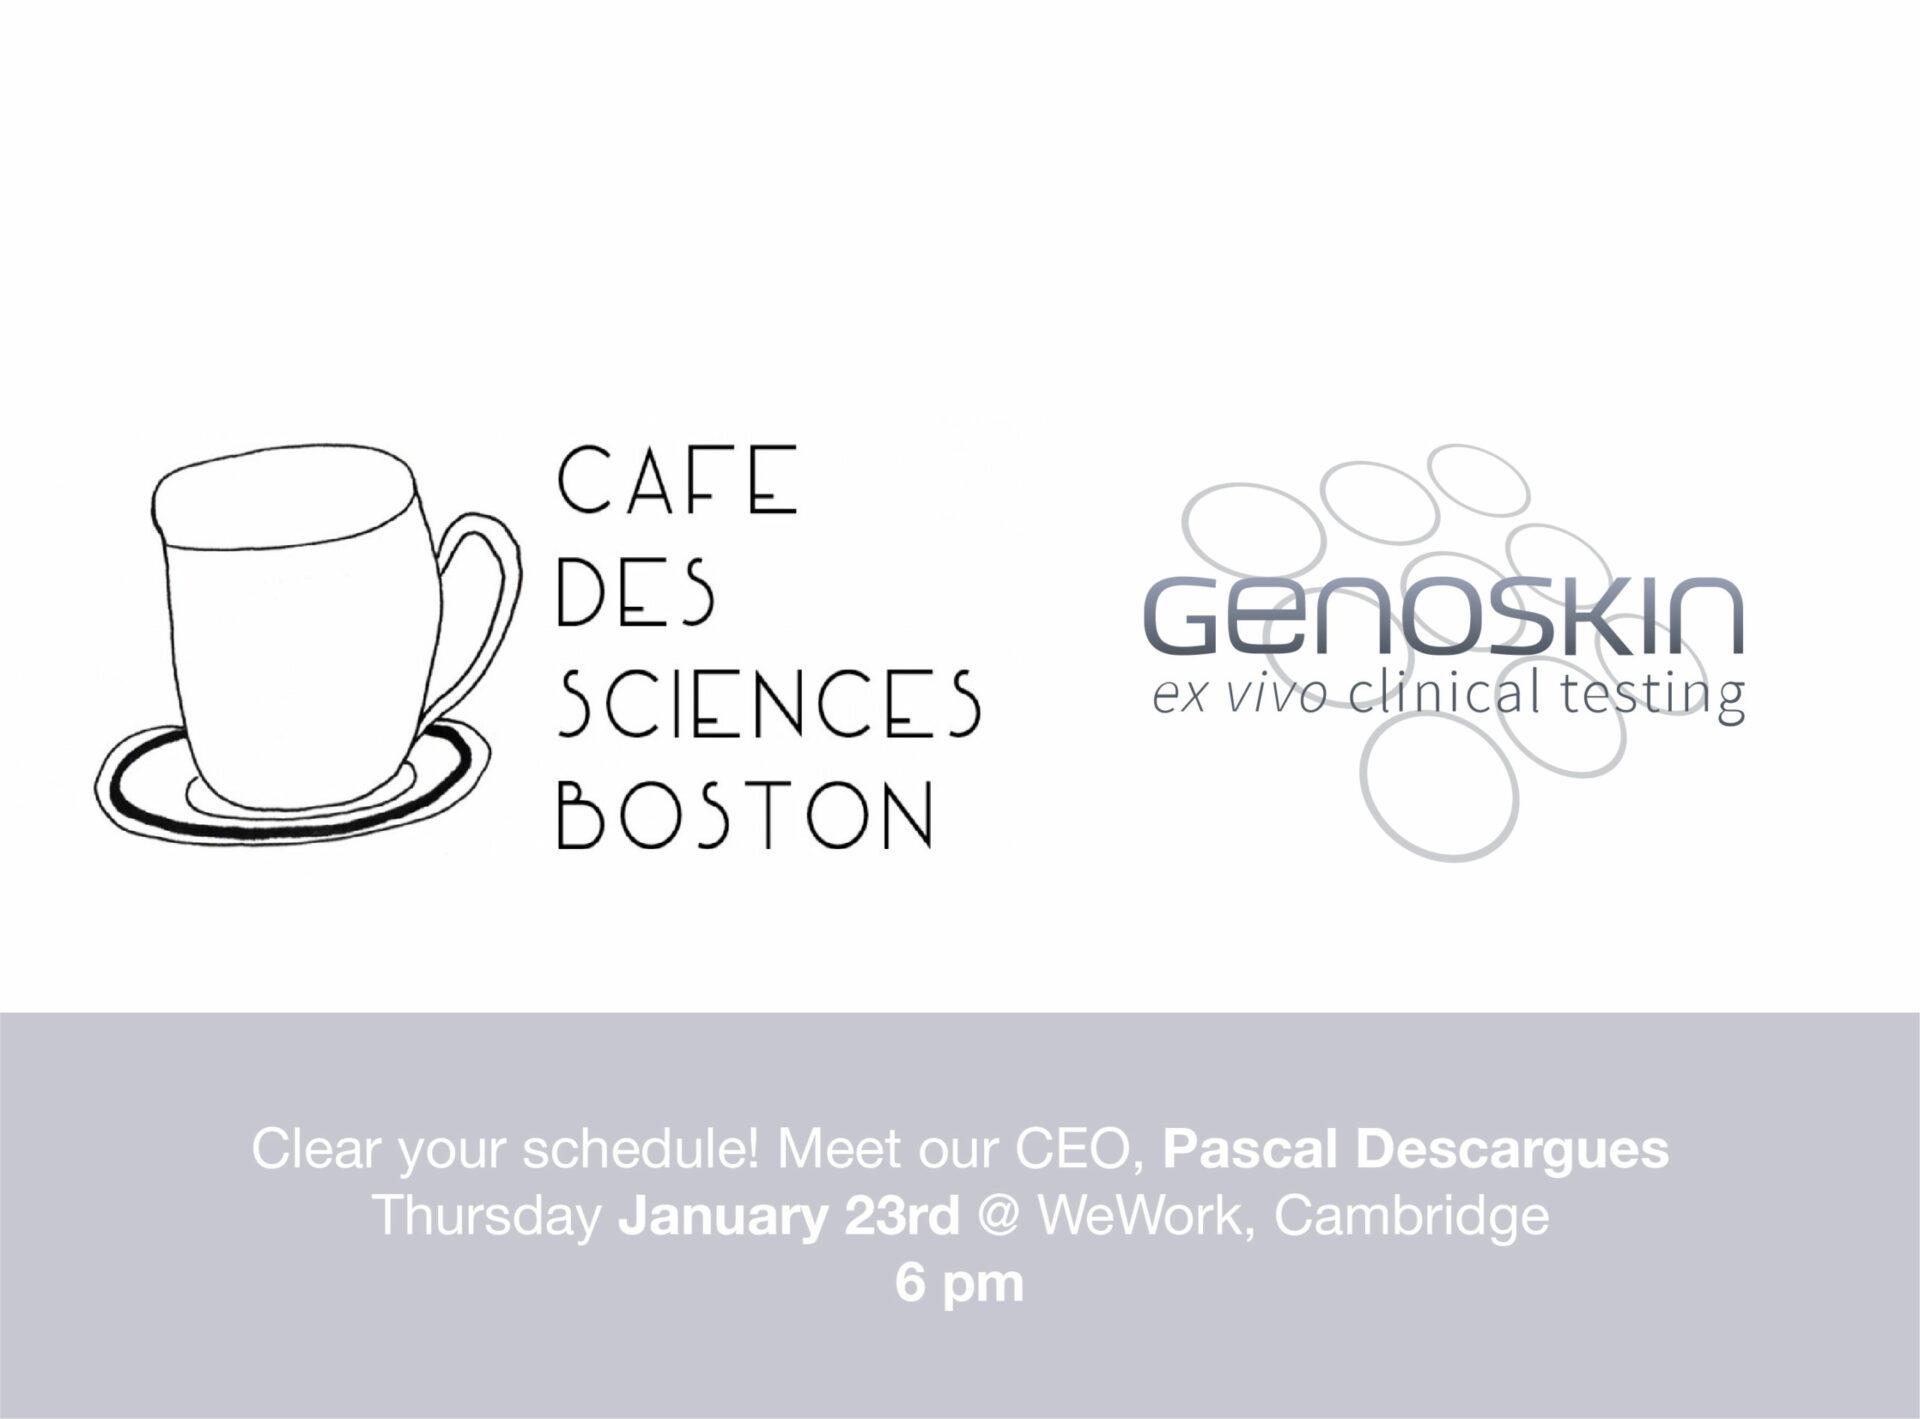 Café des Sciences Boston logo and Genoskin logo